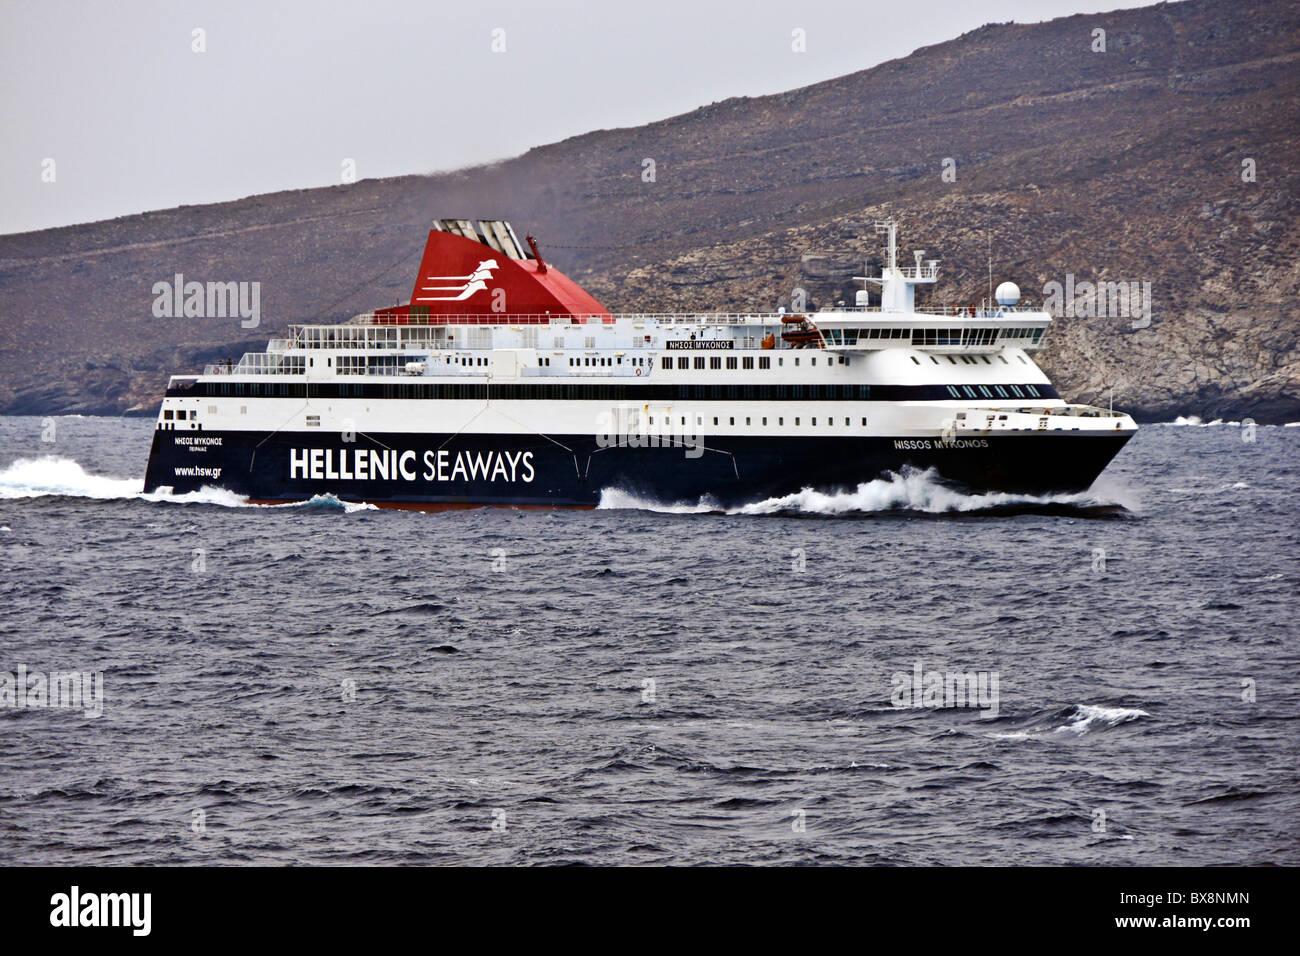 Hellenic Seaways car and passenger ferry Nissos Mykonos at sea between Mykonos and Piraeus in Greece - Stock Image